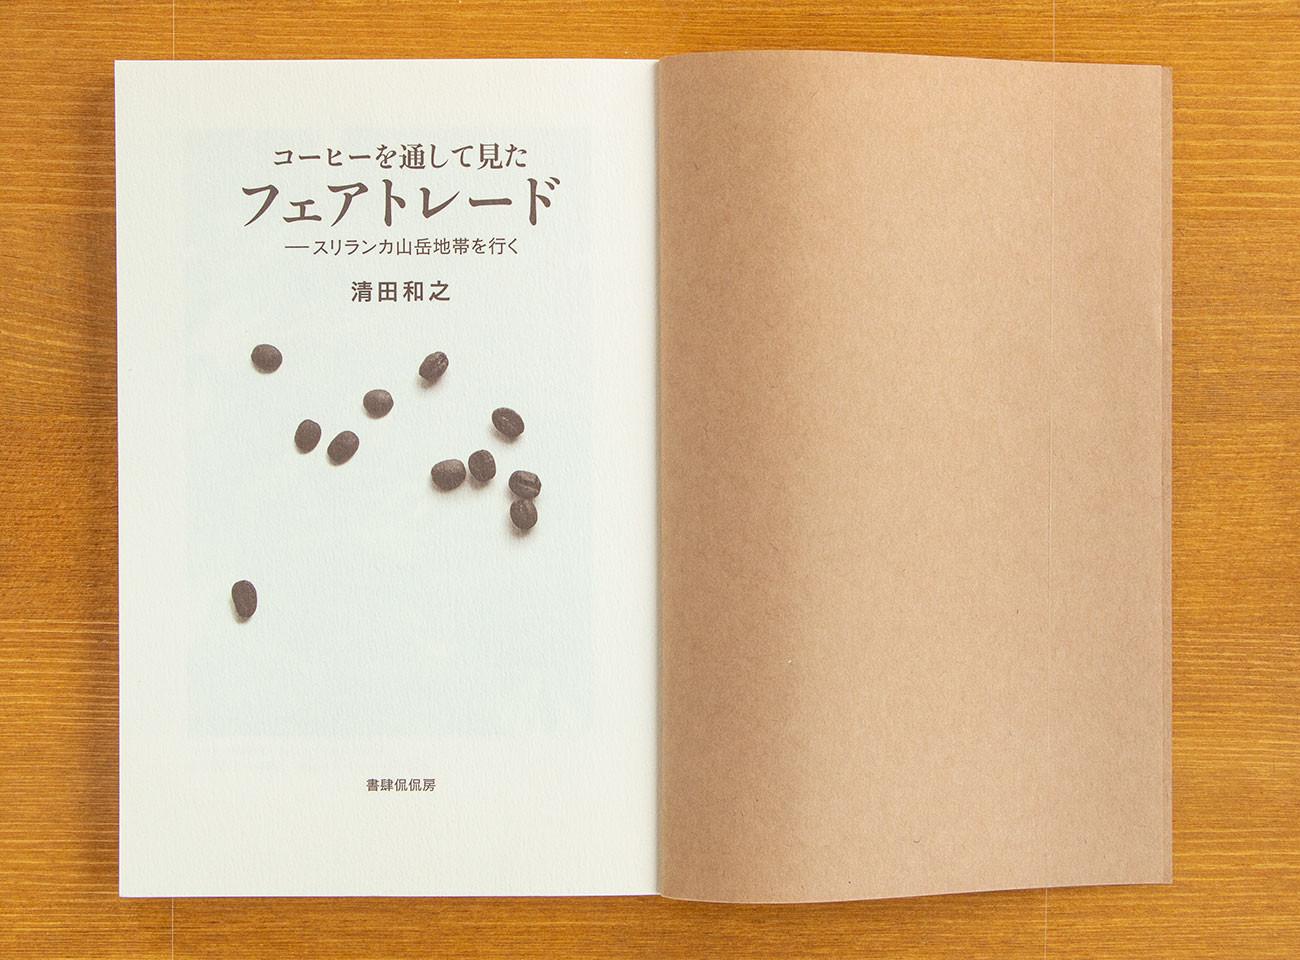 2010_Fairtrade_IMG_1895.jpg